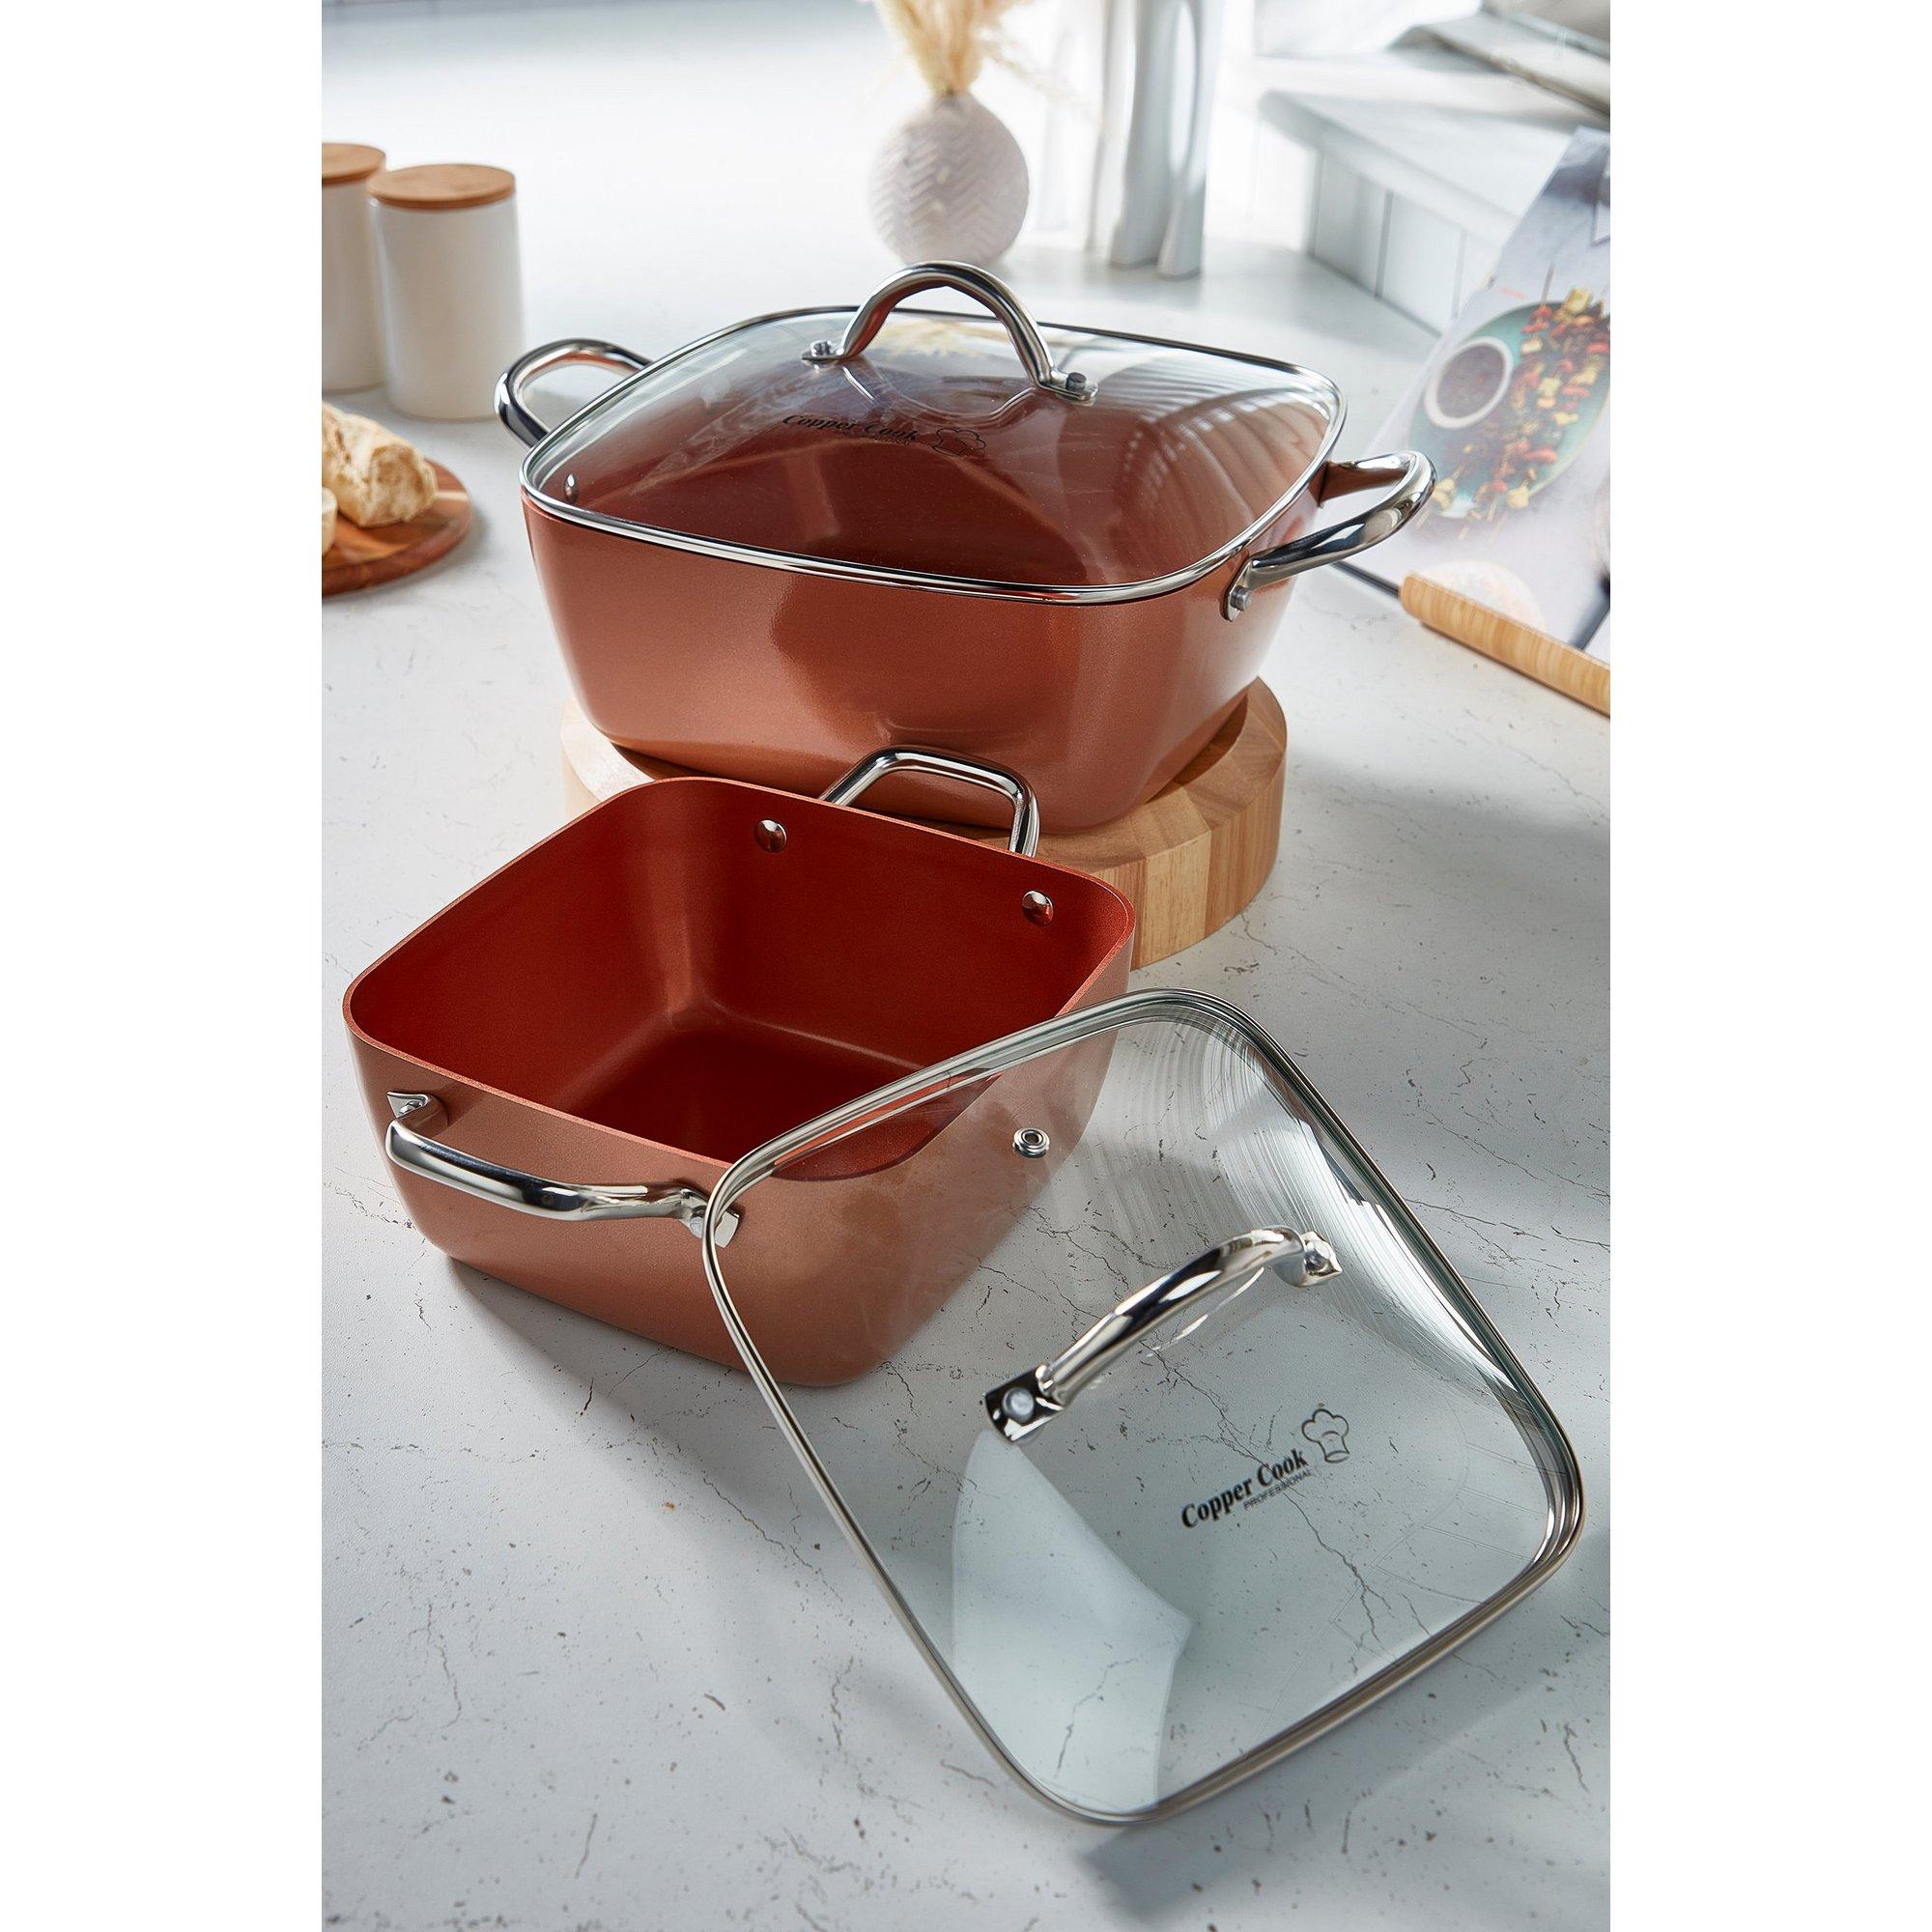 Image of Copper Cook 2-Piece Casserole Set